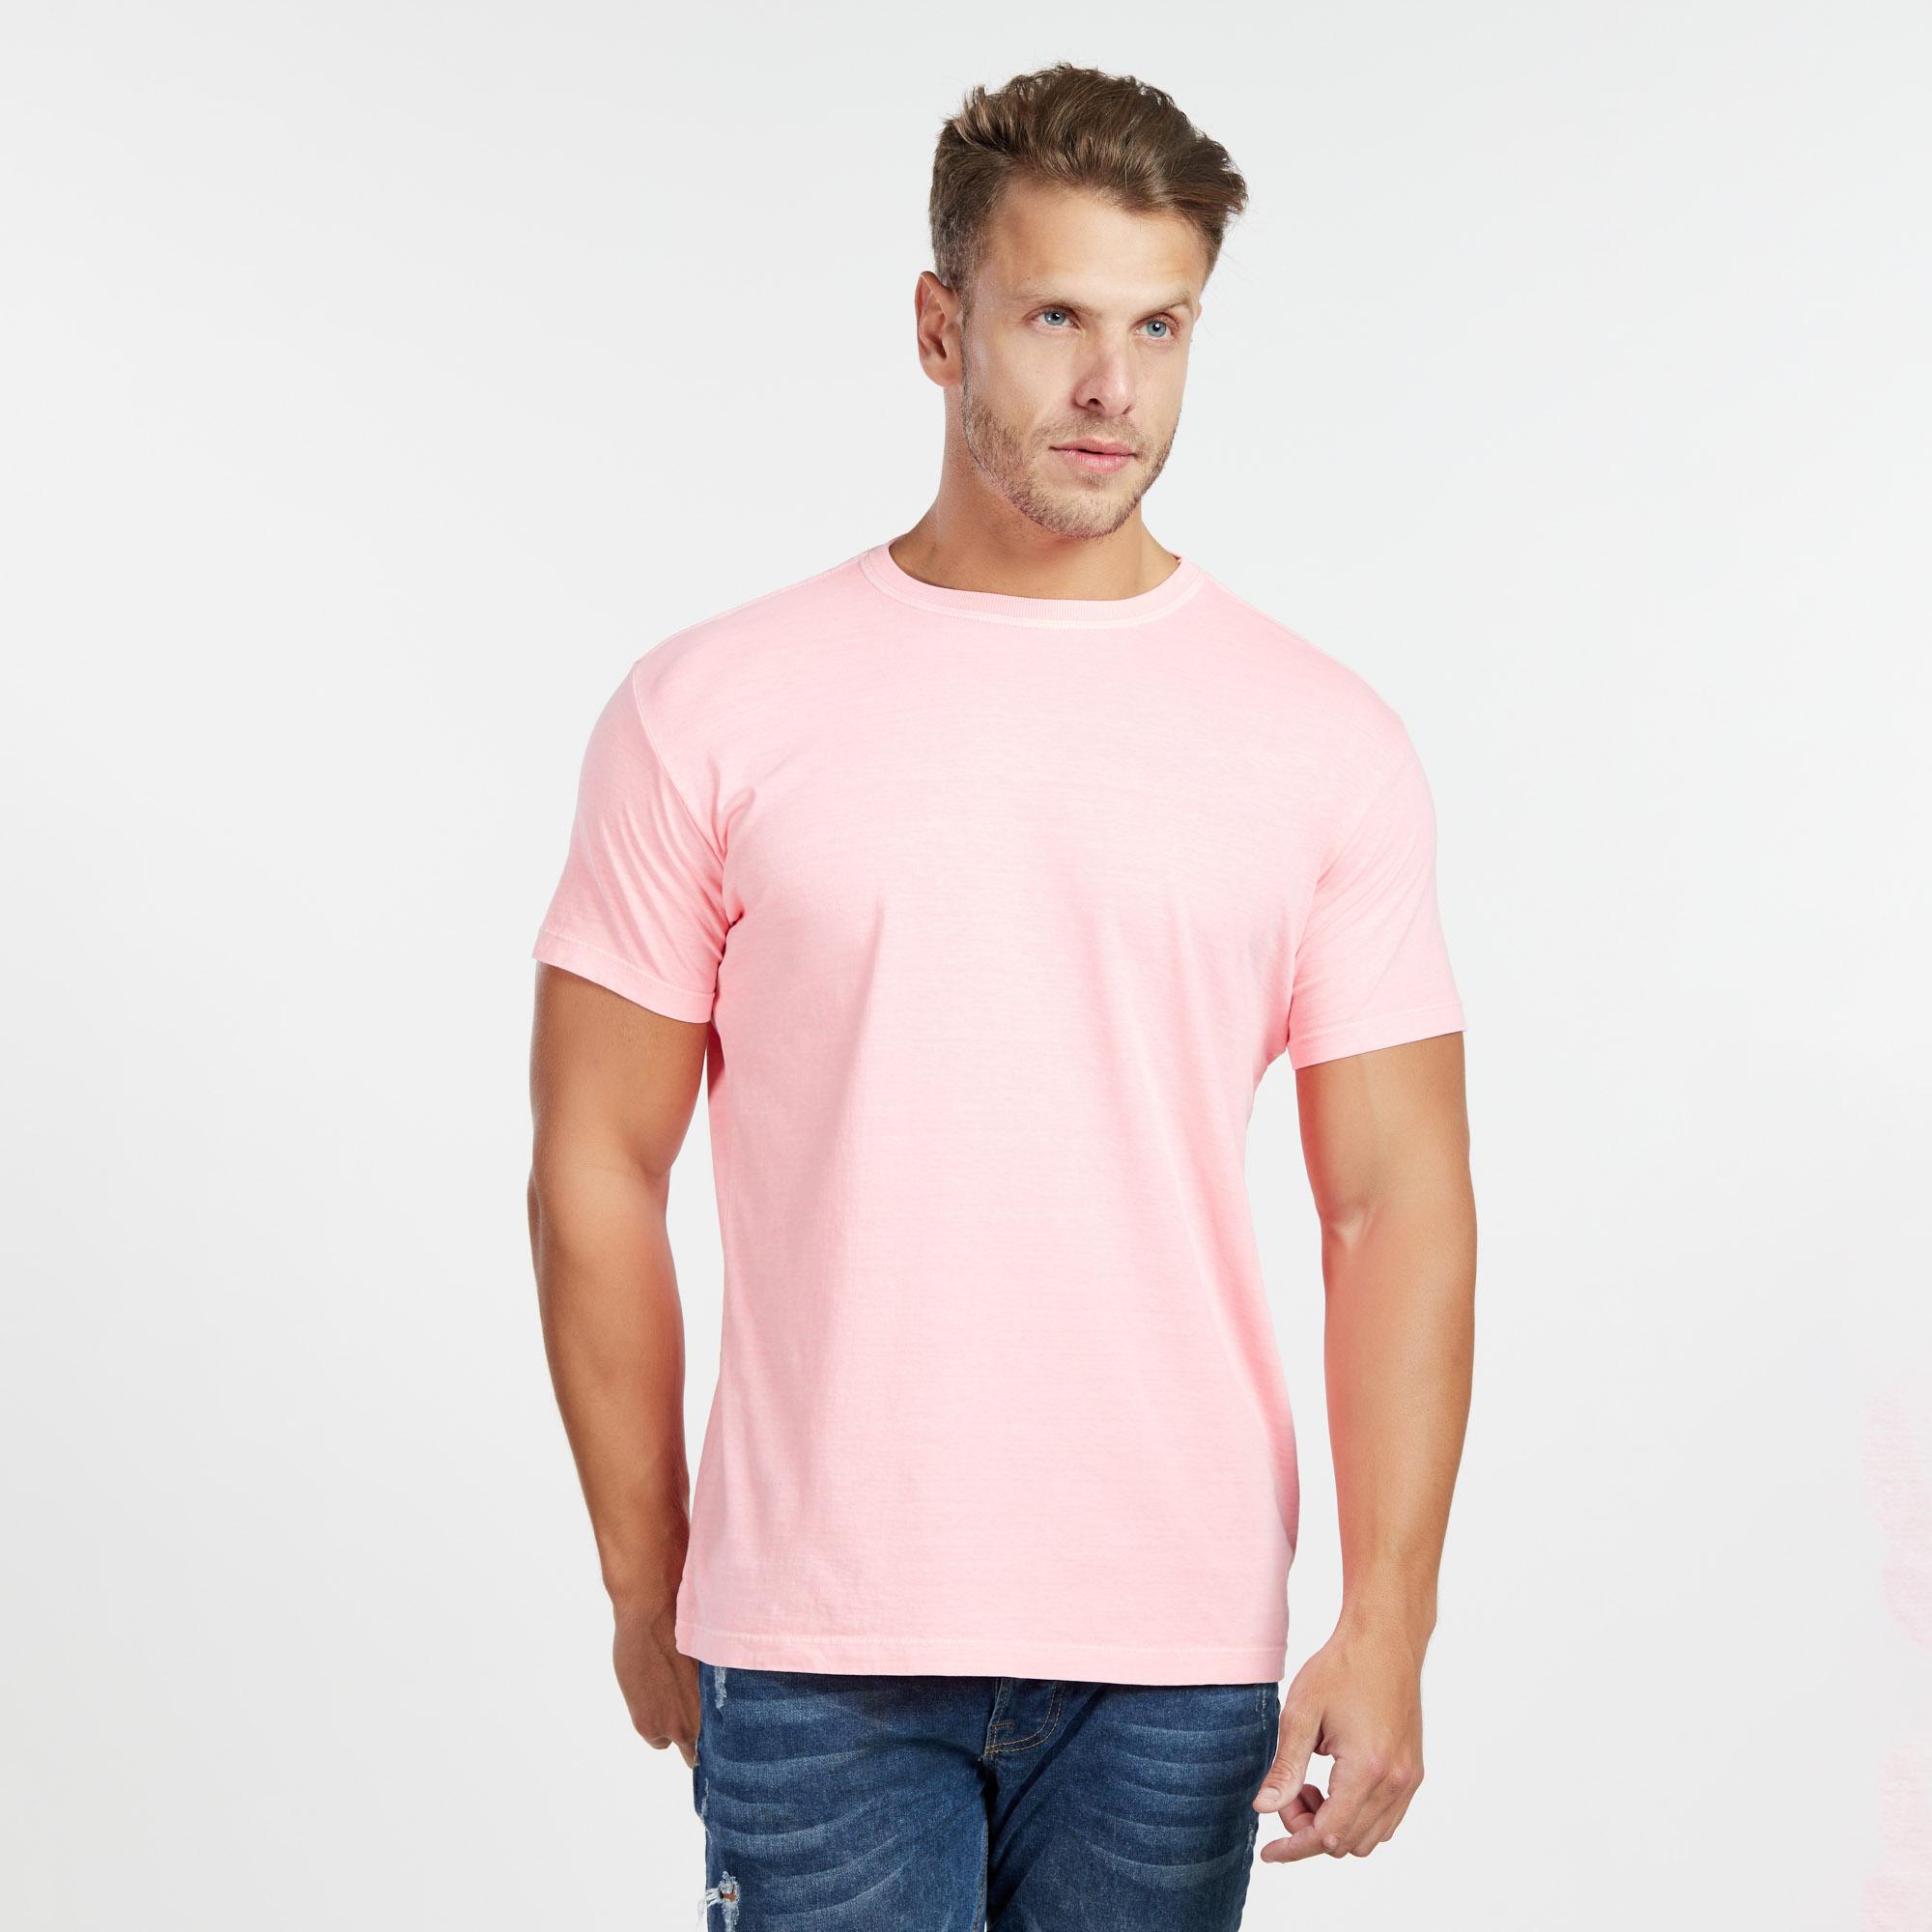 Camiseta Masculina Estonada Salmão Neon